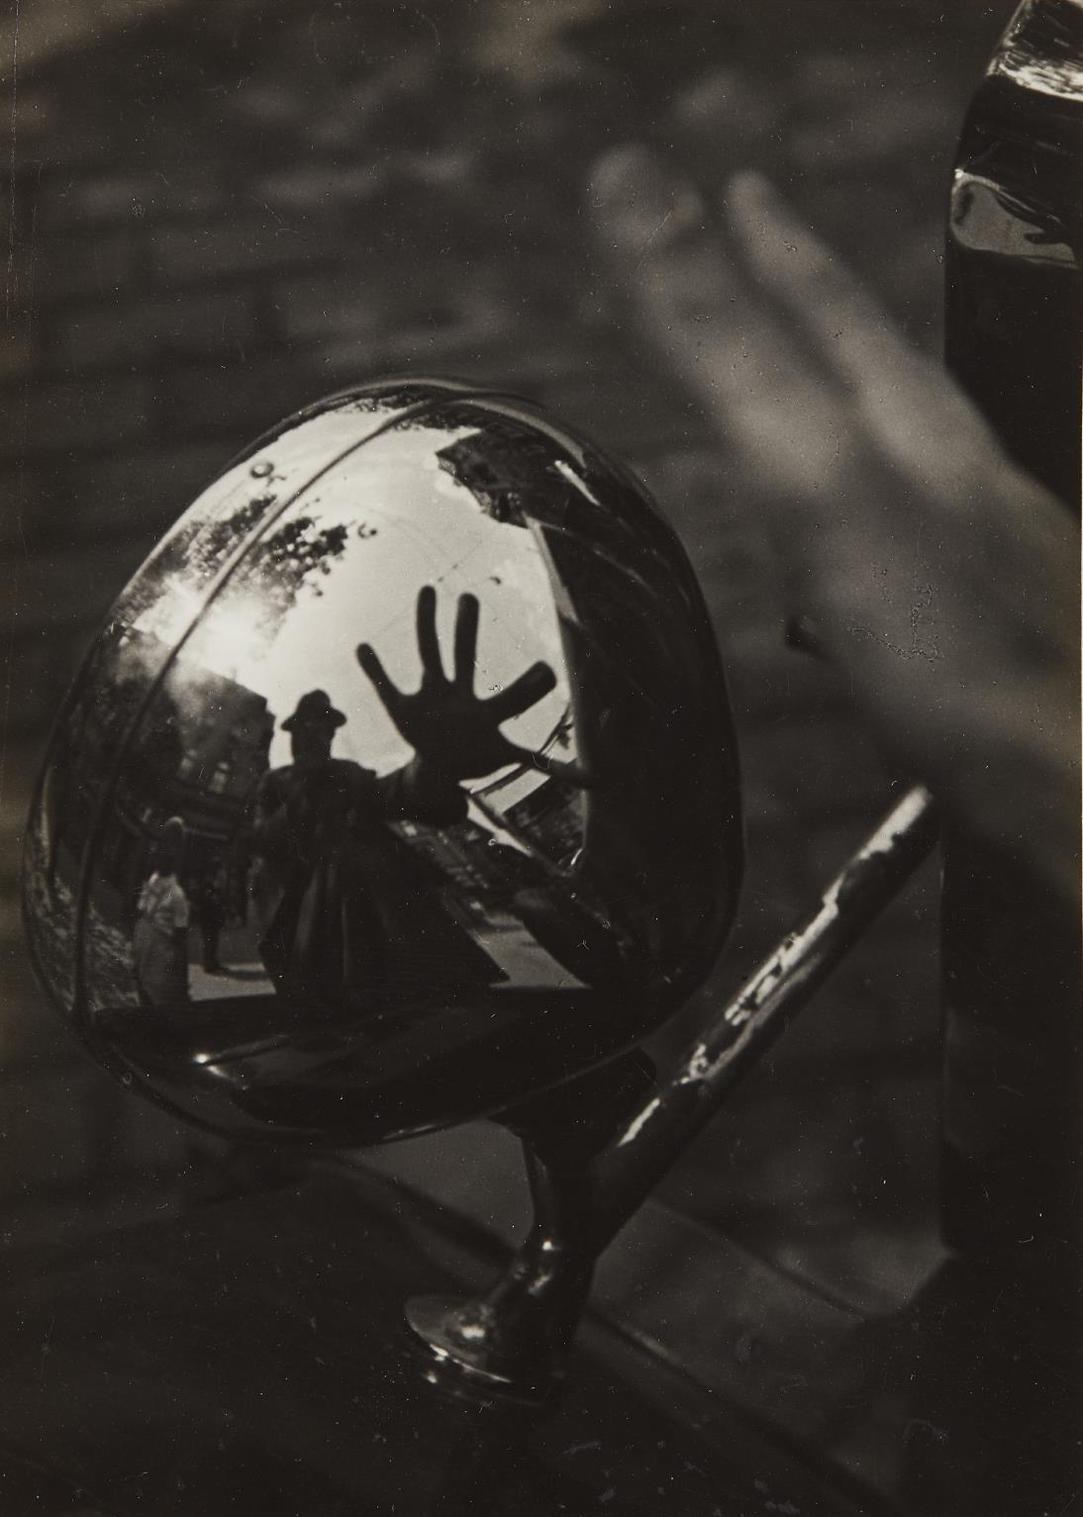 Imre Kinszki-Self-Portrait In Reflection Of Car Headlight-1934